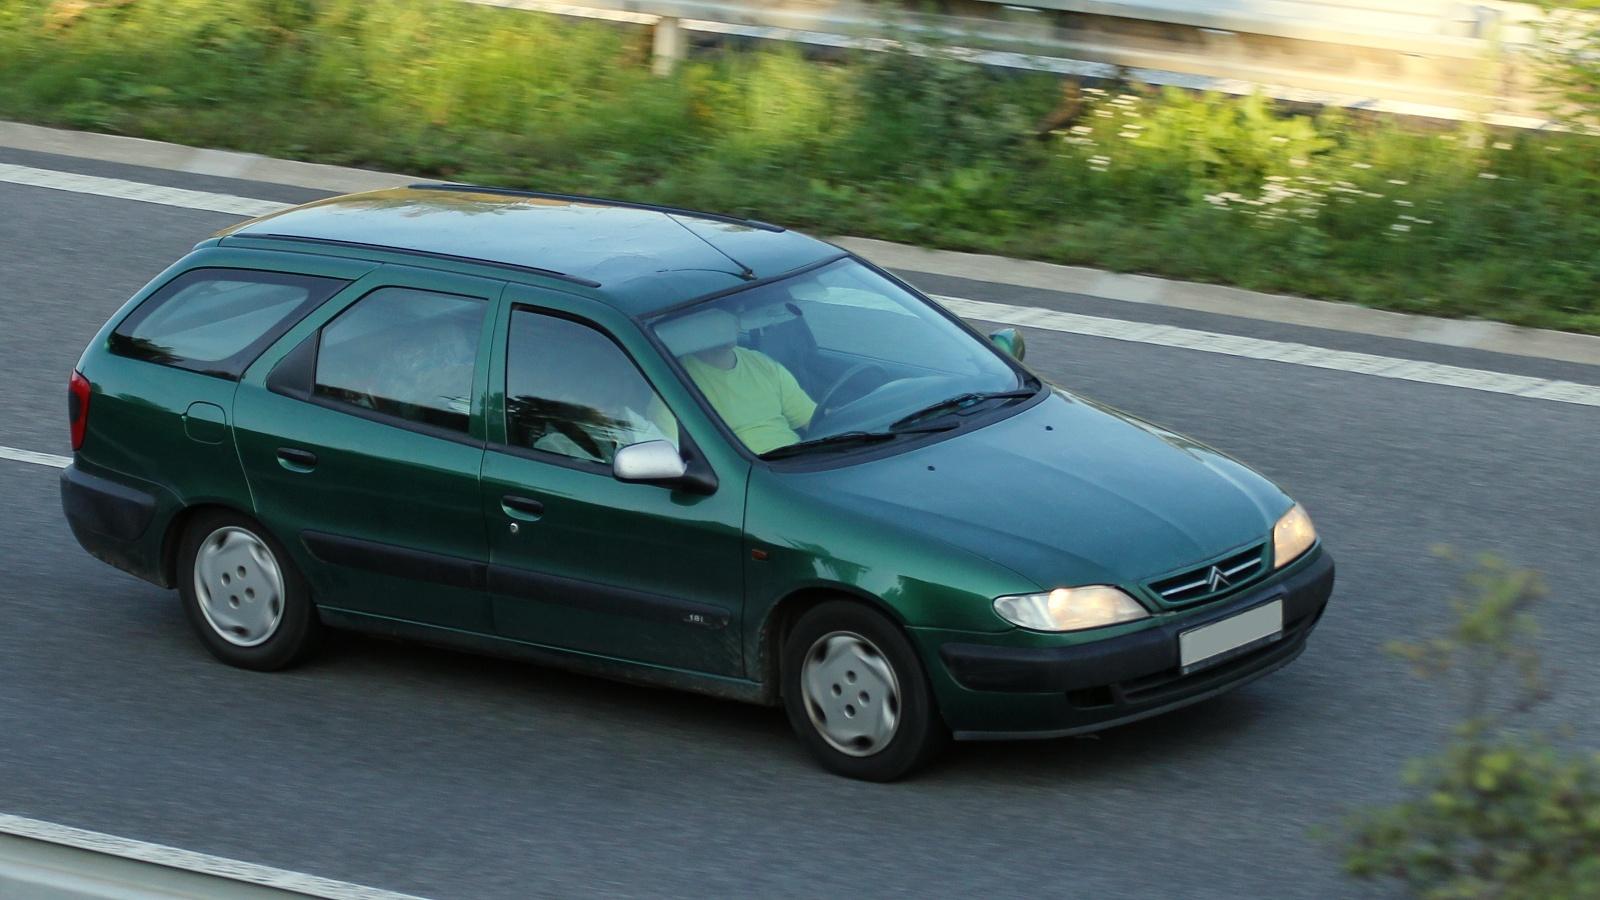 pin citroen xsara break glx 16 16v 4p gasolina 2003 carros on pinterest. Black Bedroom Furniture Sets. Home Design Ideas